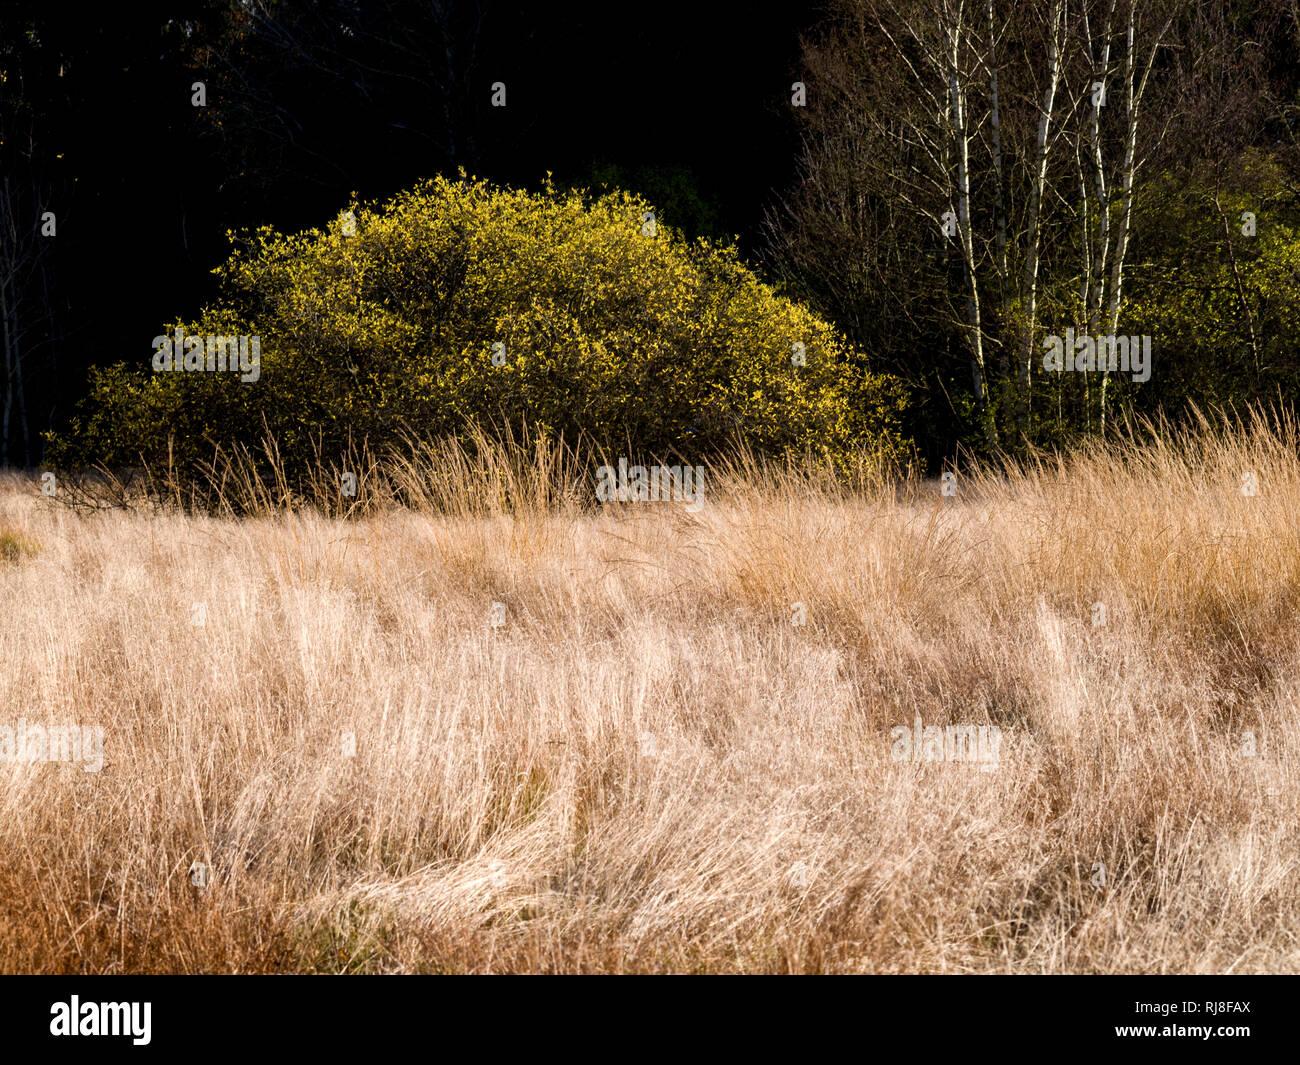 Deutschland, Bayern, Naturpark Bayrische Rhön, UNESCO-Biosphärenreservat, Naturschutzgebiet Schwarzes Moor, windgeformte Moorgräser, Birken und Salwei Foto de stock